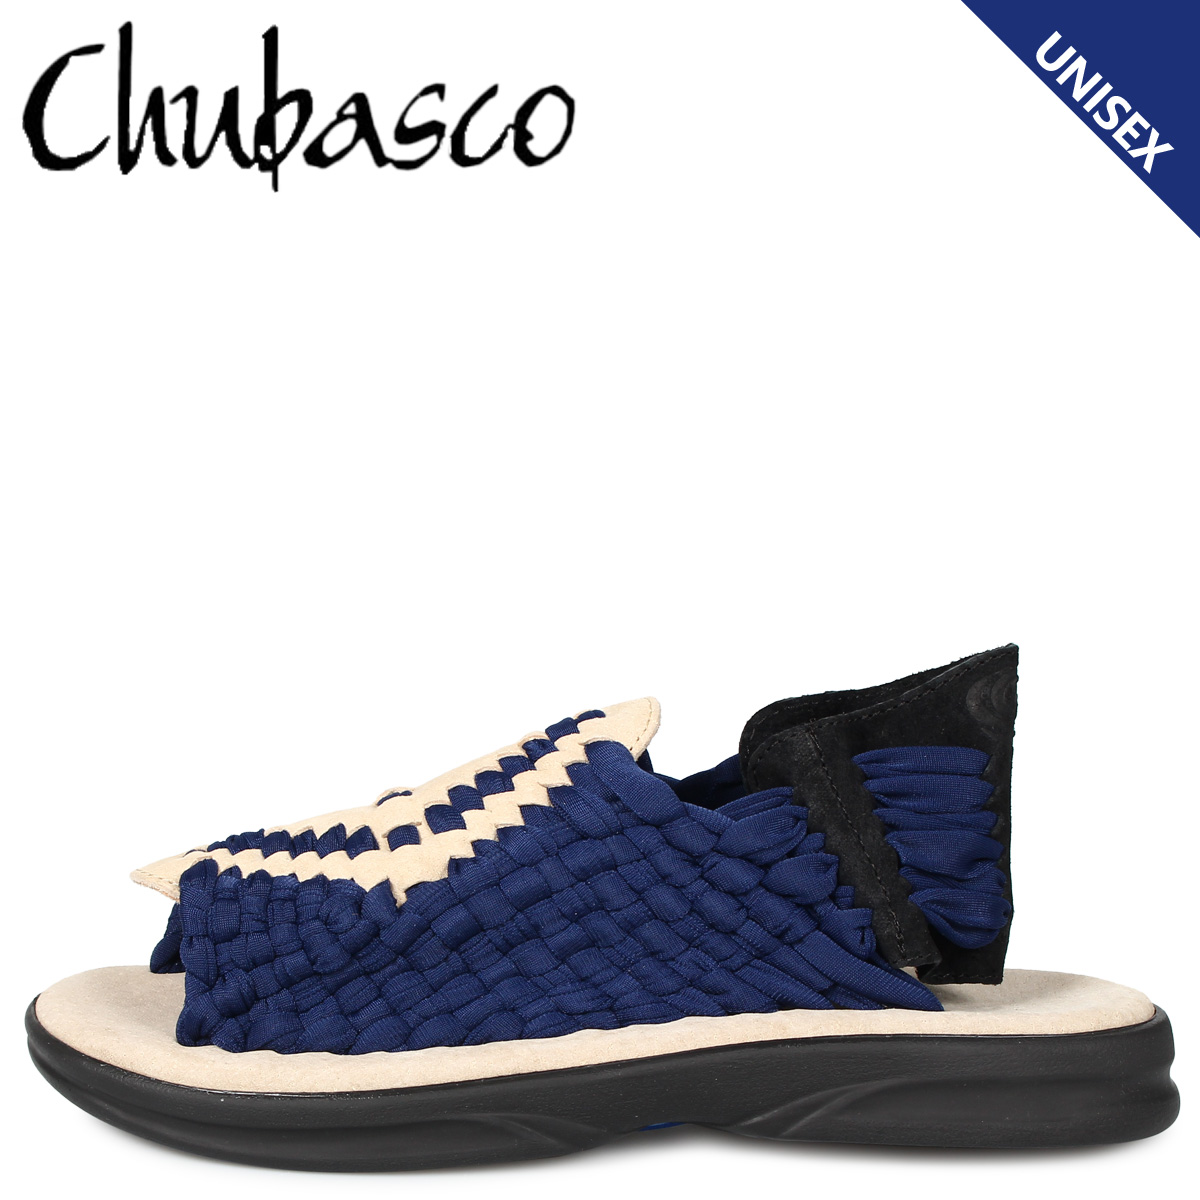 CHUBASCO チュバスコ アズテック サンダル スポーツサンダル メンズ レディース AZTEC ネイビー AZ16020O